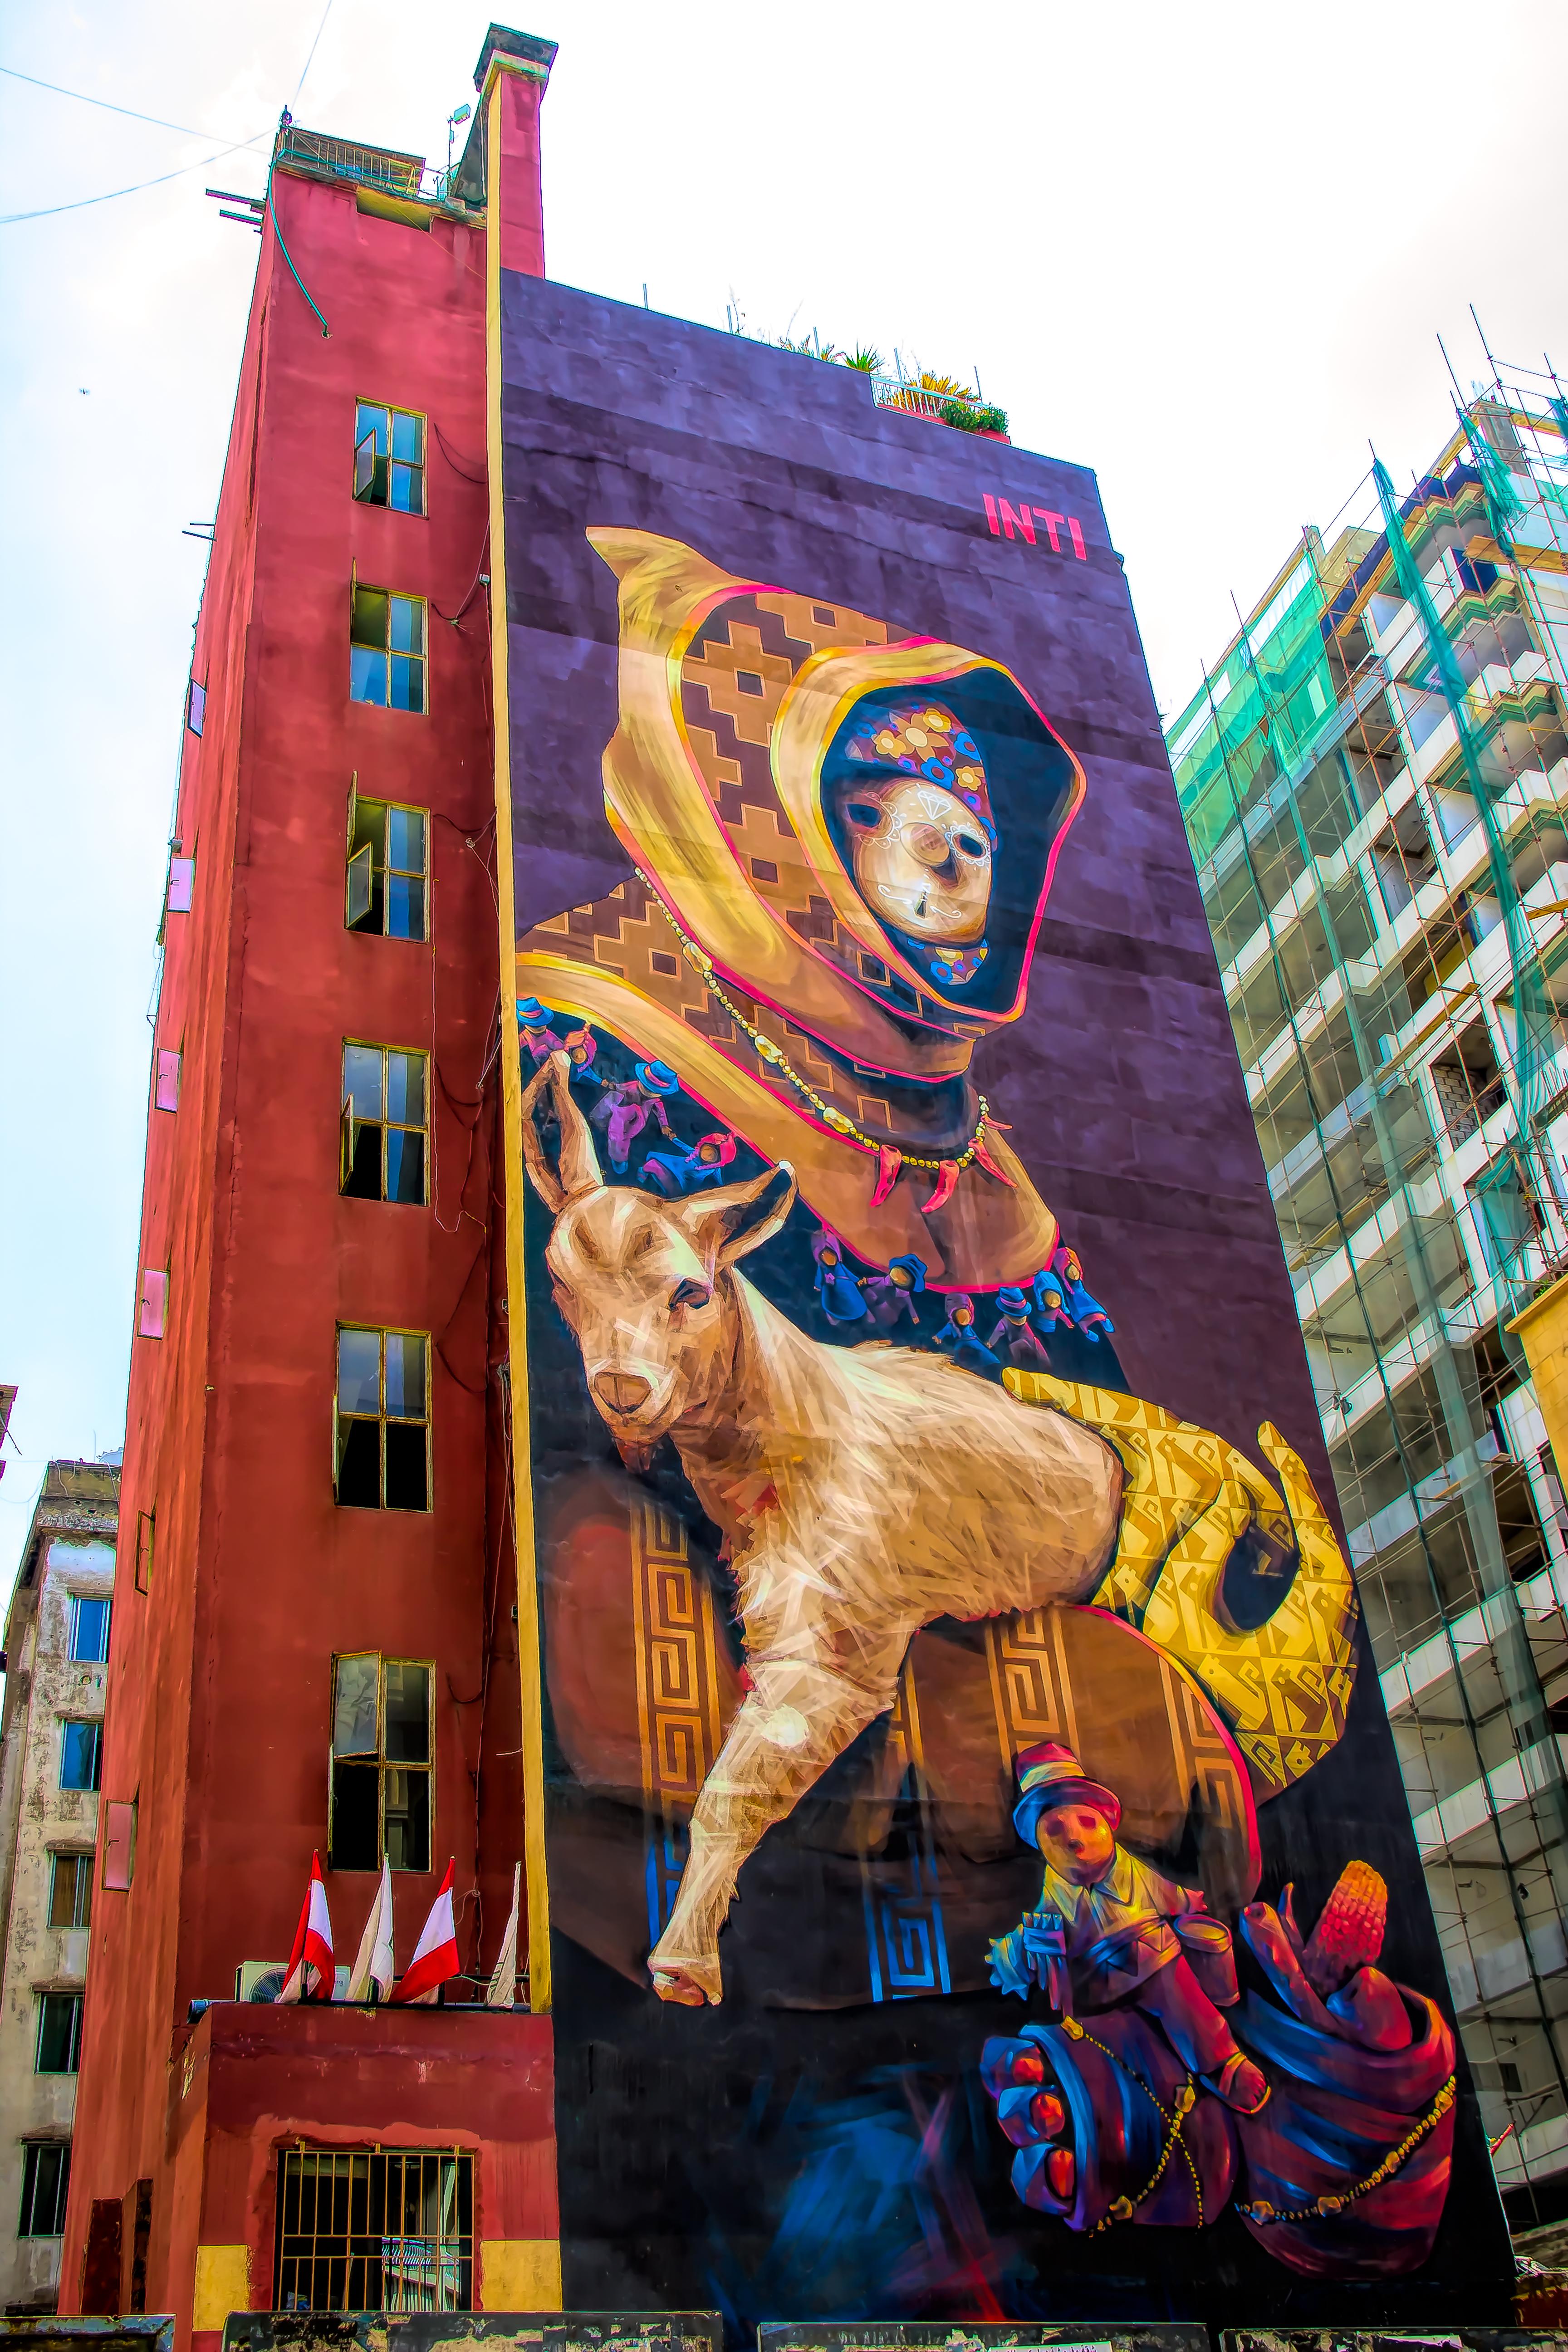 Artist: INTI (Chili)